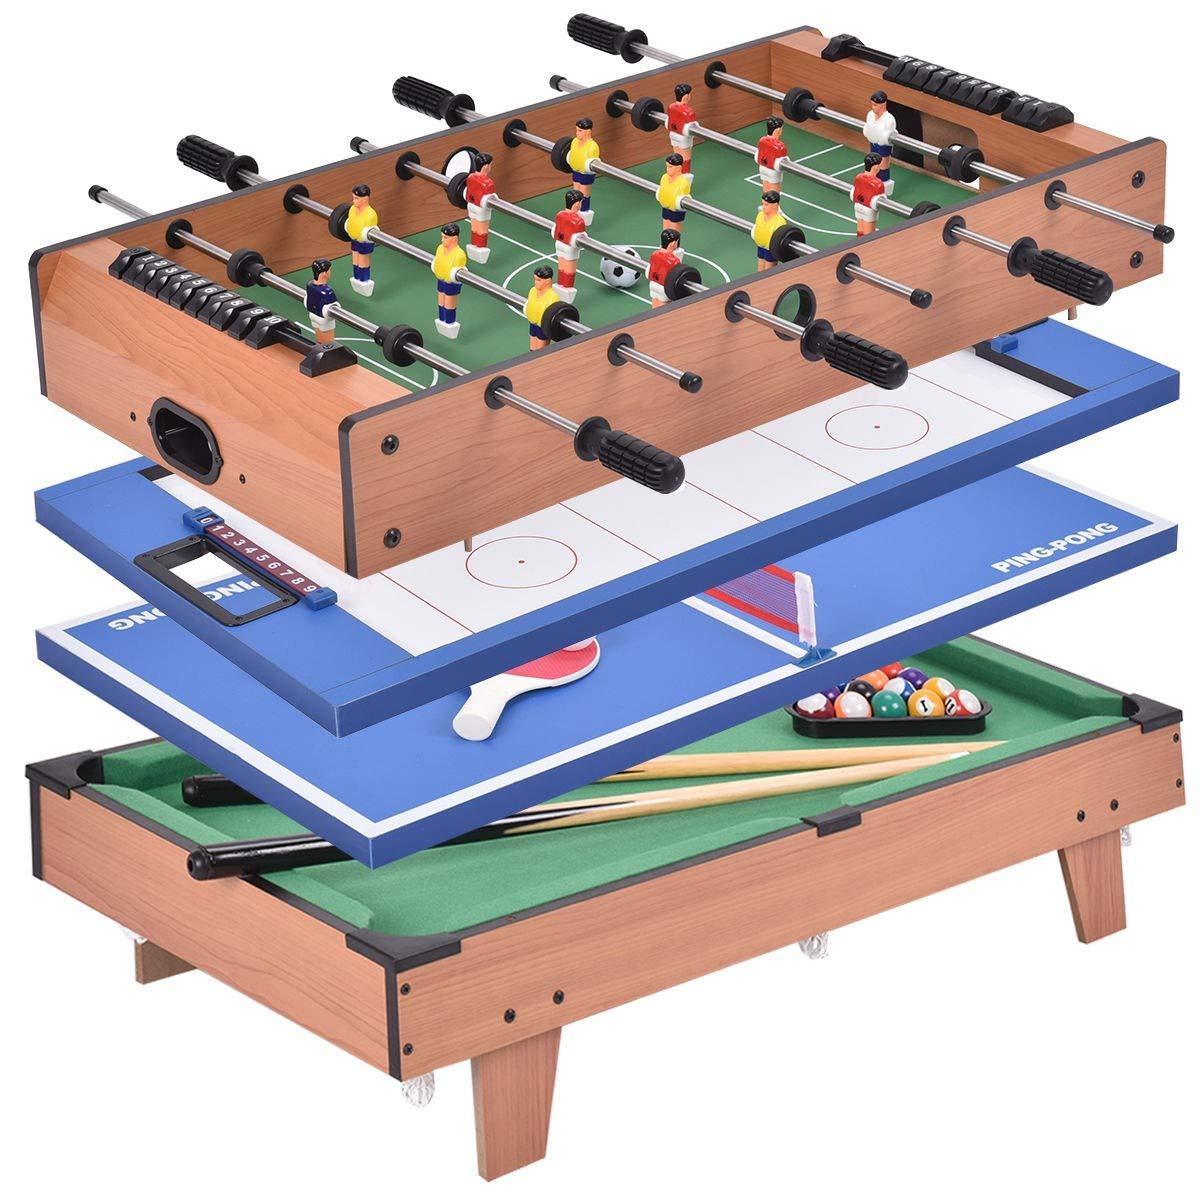 USA_BEST_SELLER 4 in 1 Multi Game Swivel Steady Combo Game Table Hockey Soccer Foosball Pool Tennis Table